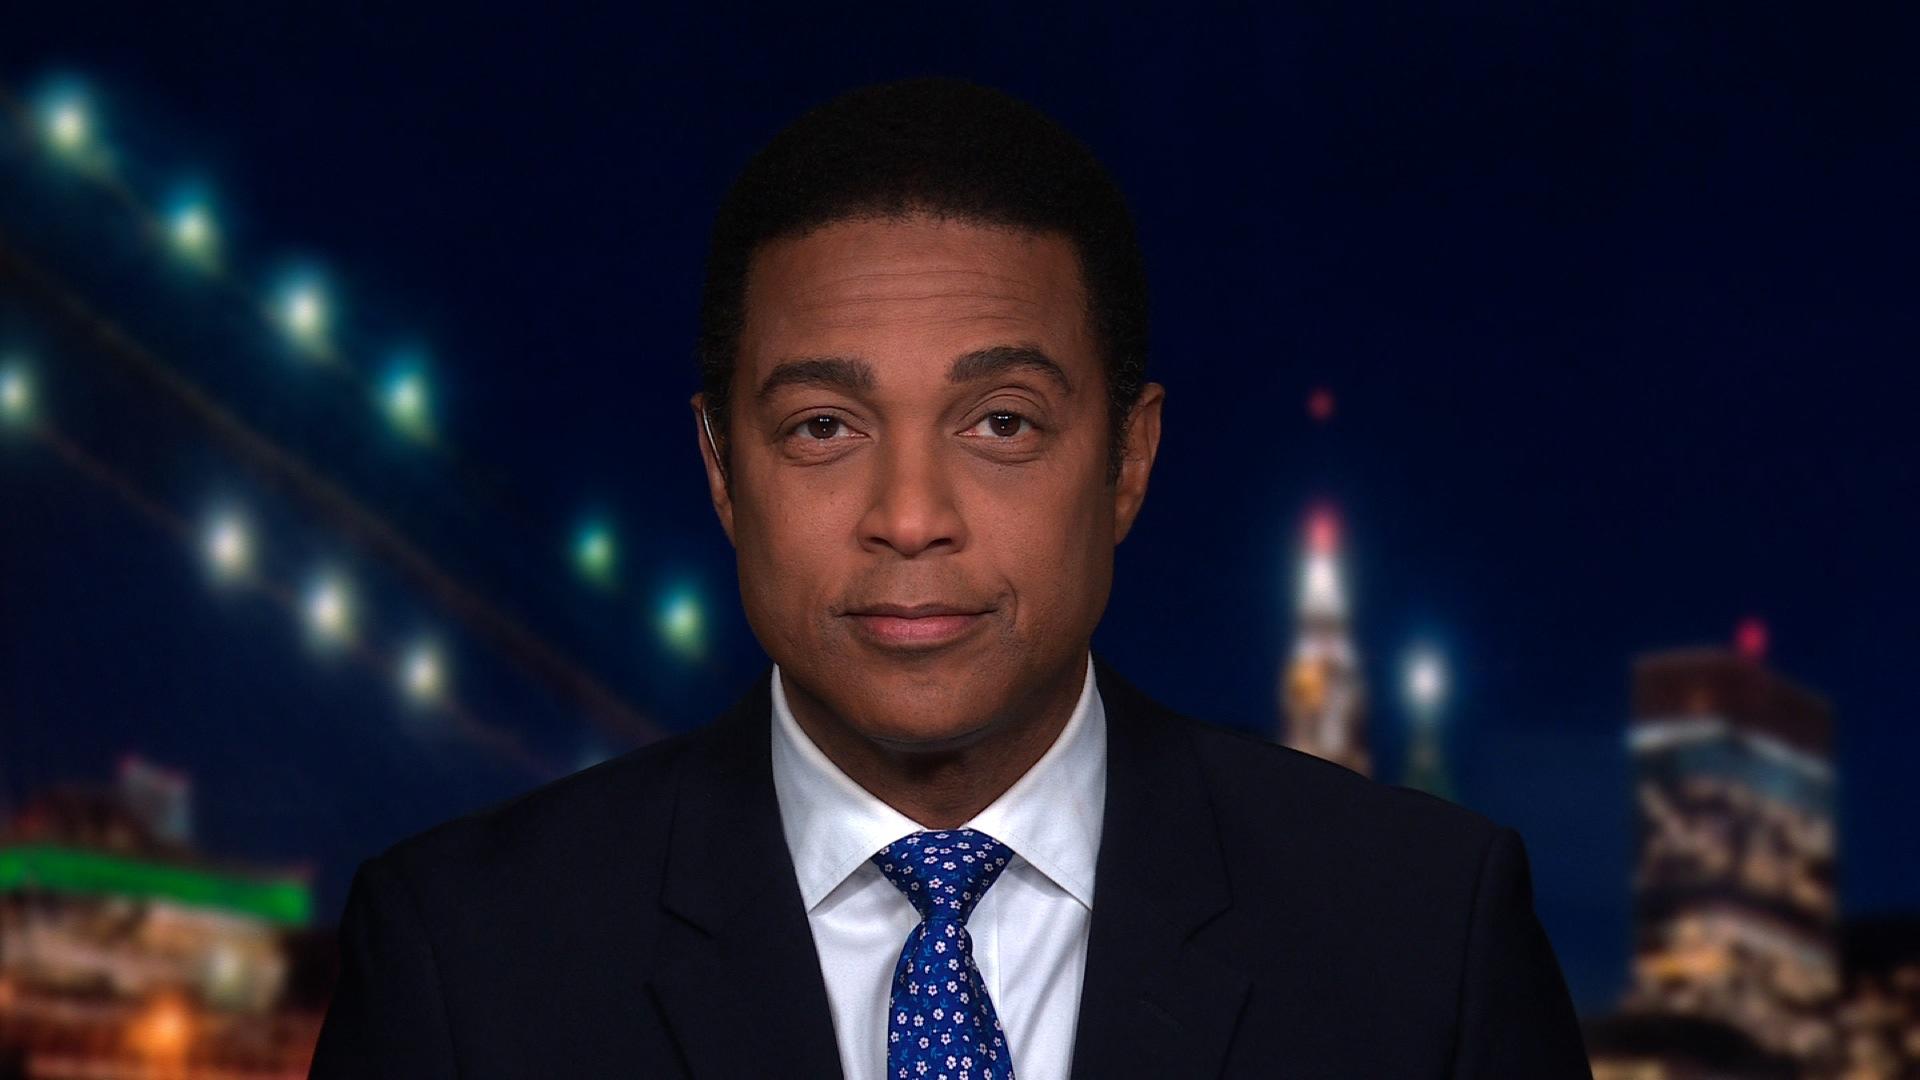 Don Lemon Obama Lives Rent Free In Trumps Head Cnn Video